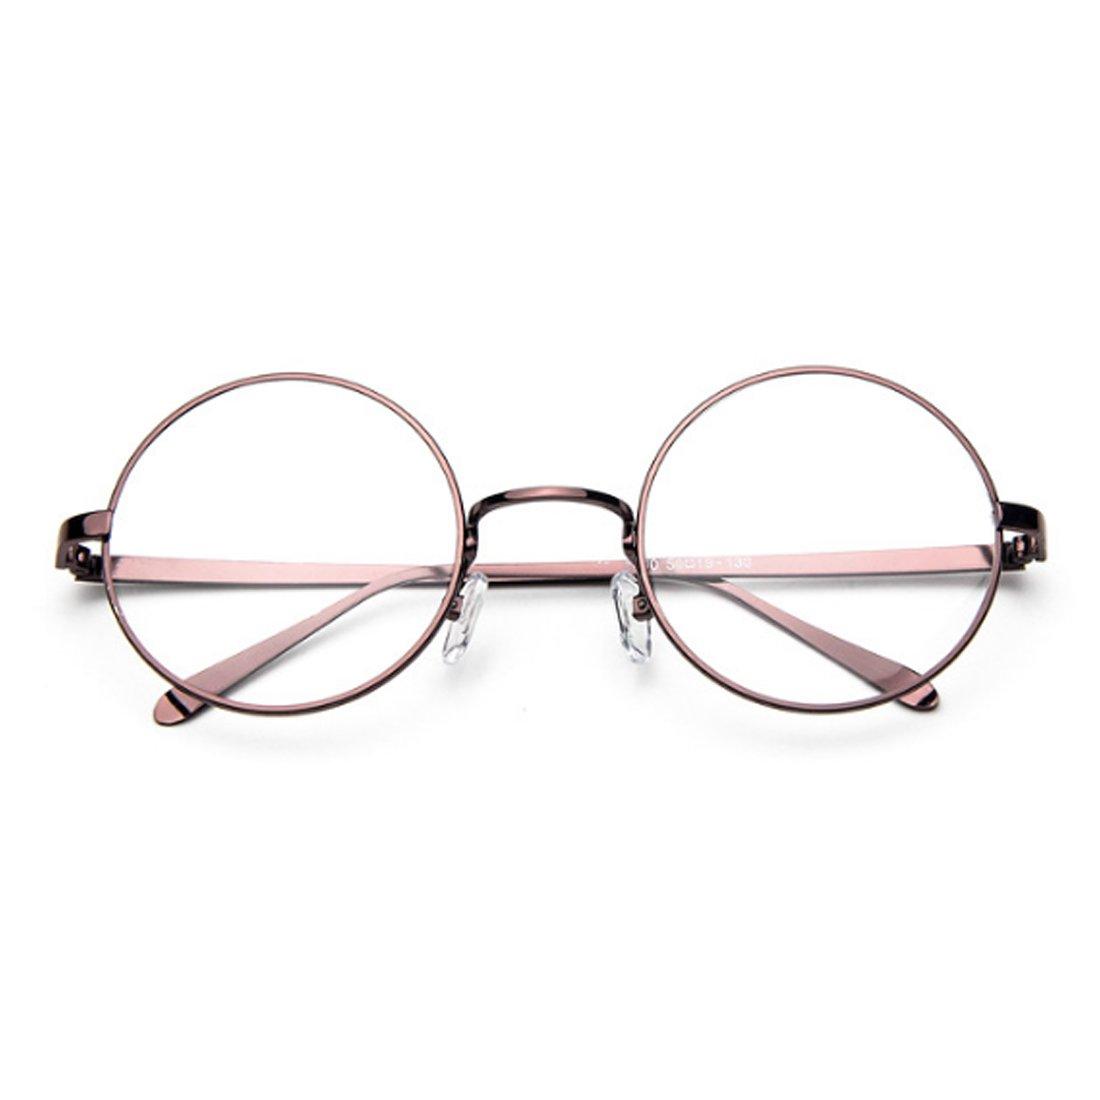 Fulision Male Female Circular myopia Glasses frame Fine Frame Retro Glasses by Fulision (Image #2)